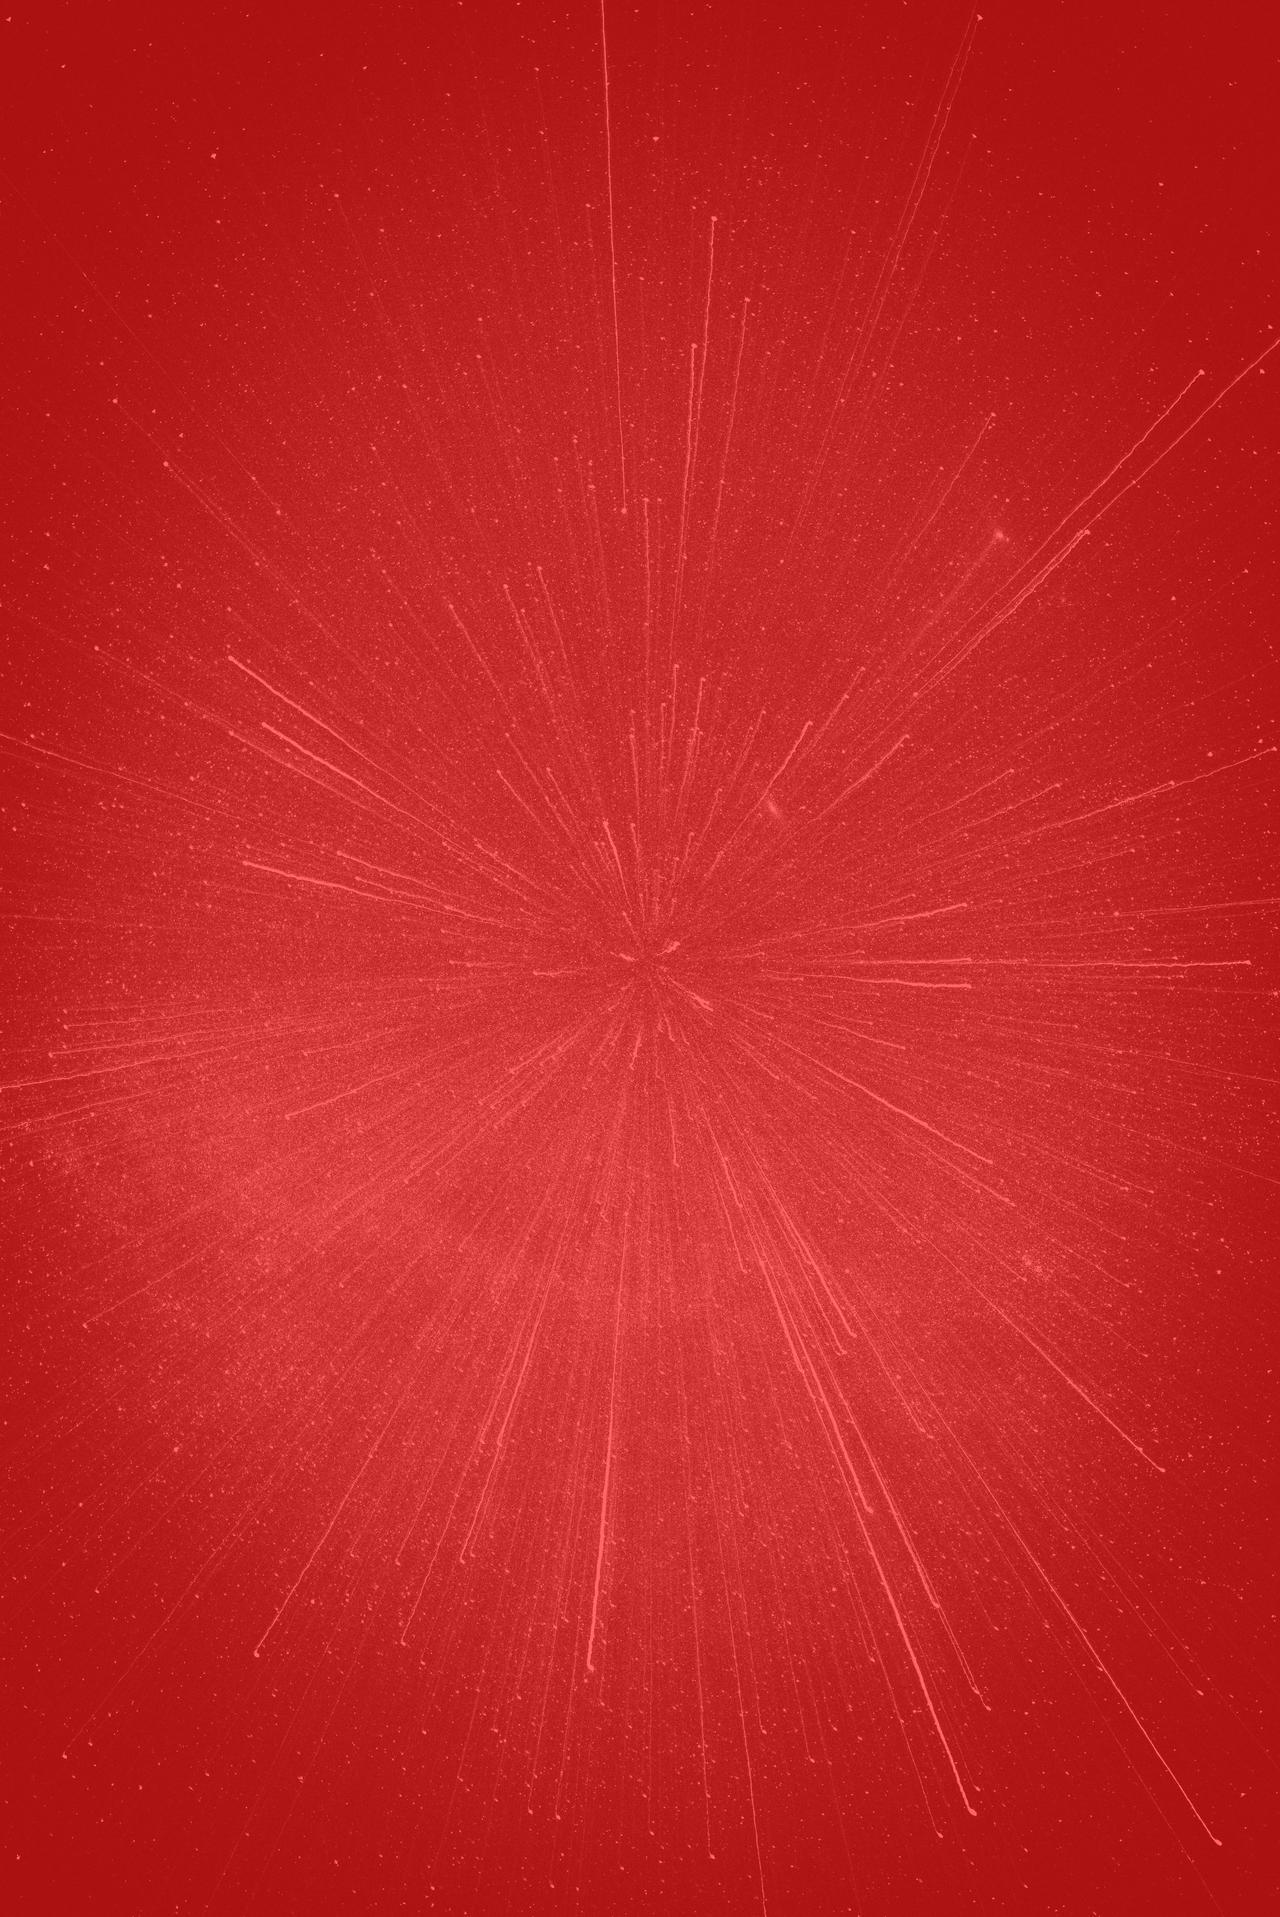 1b534da6-b696-11ea-b25f-0242ac110002-casey-horner-rmowqdcqn2e-unsplash-red.jpg